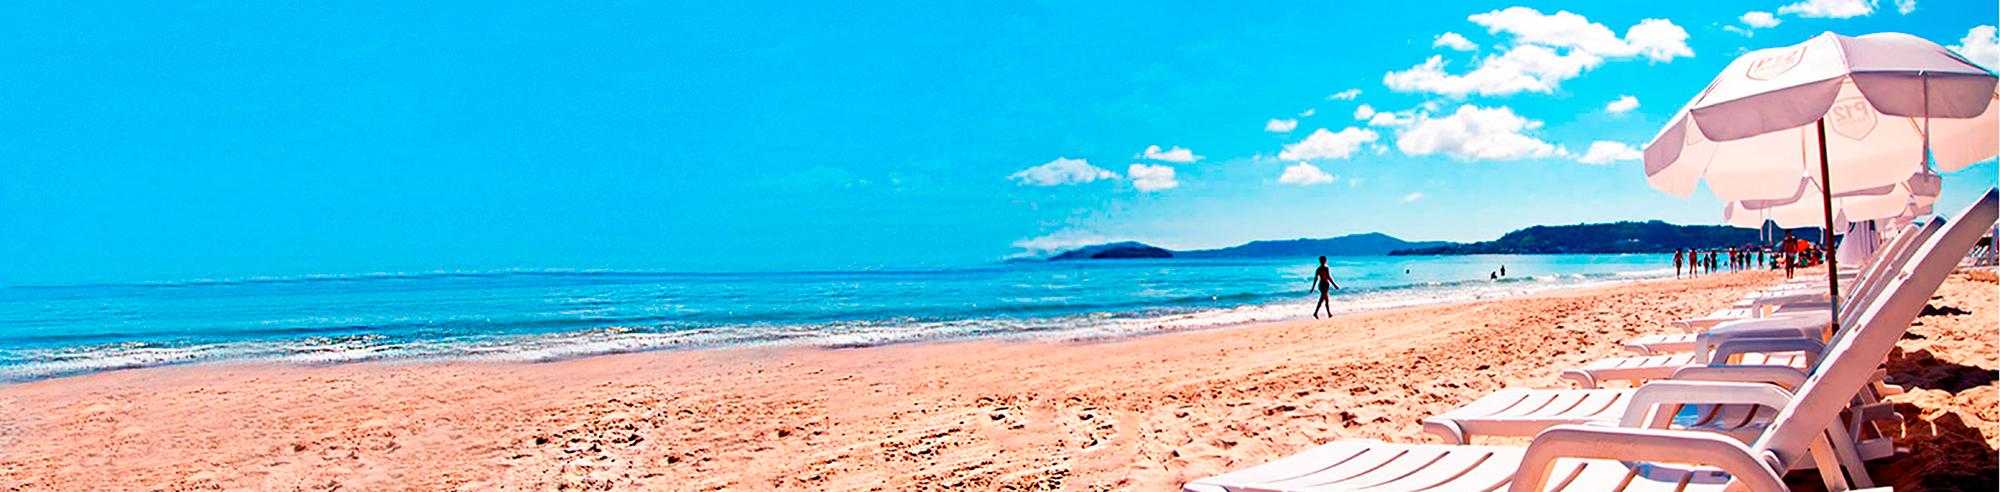 Praia Reduzido